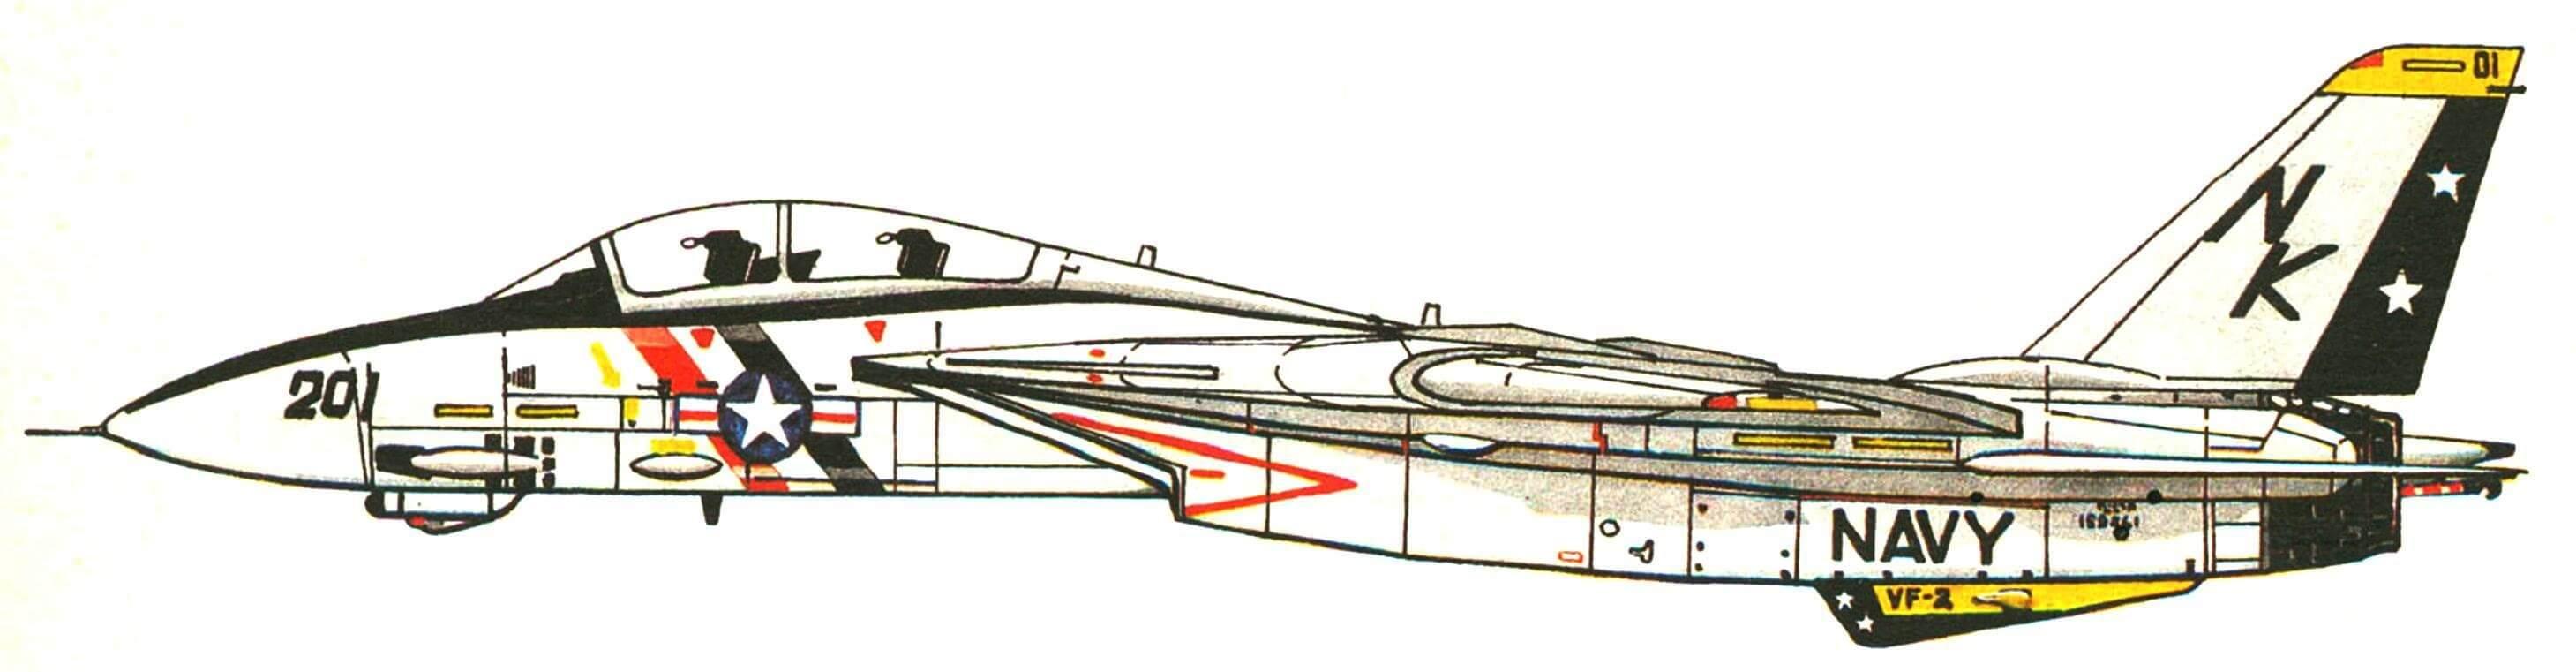 Самолет эскадрильи VF-2, авианосец «Constellation»